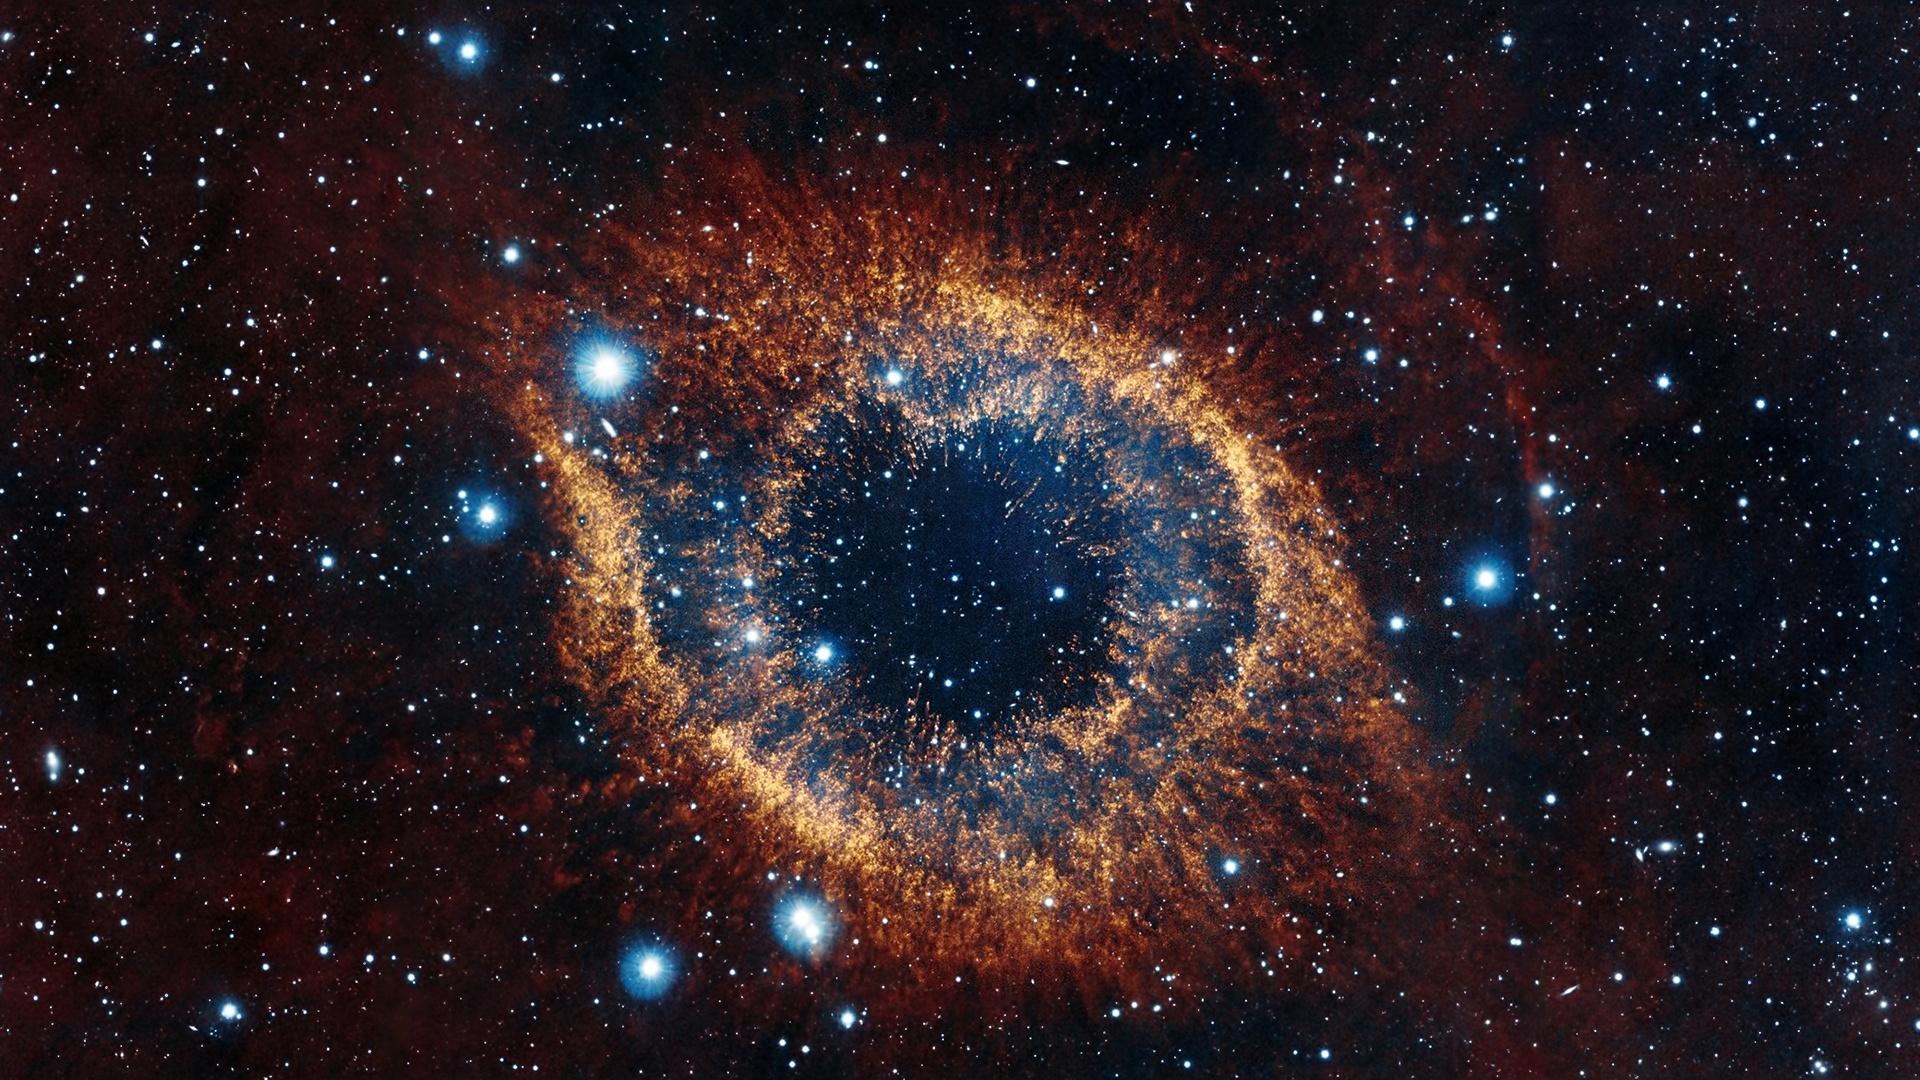 Wallpaper : helix nebula, space, stars, explosion ...